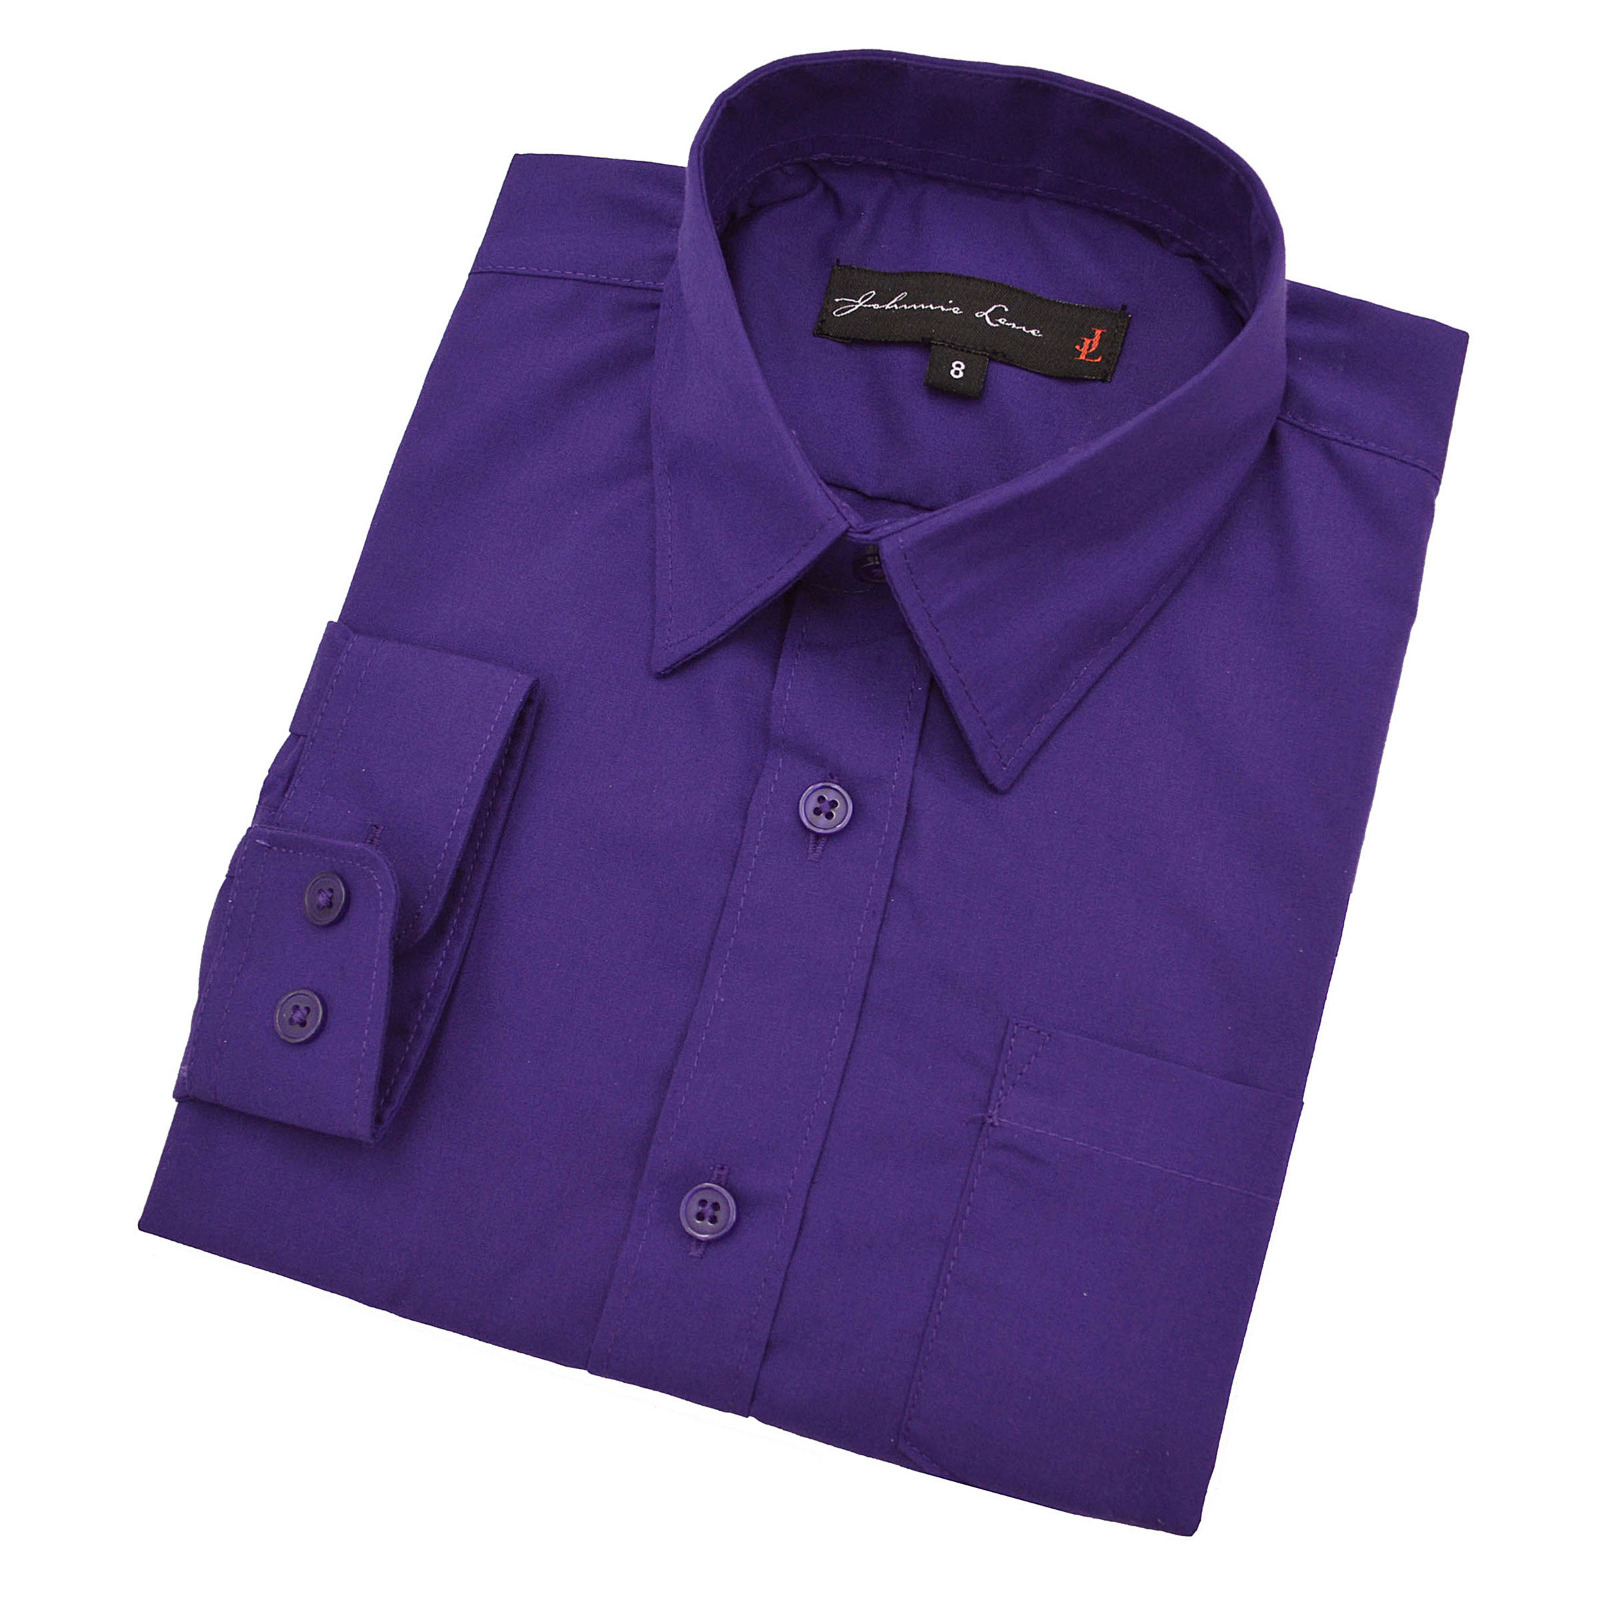 Johnnie Lene Boys Long Sleeve Dress Shirt with Tie and Handkerchief at Sears.com